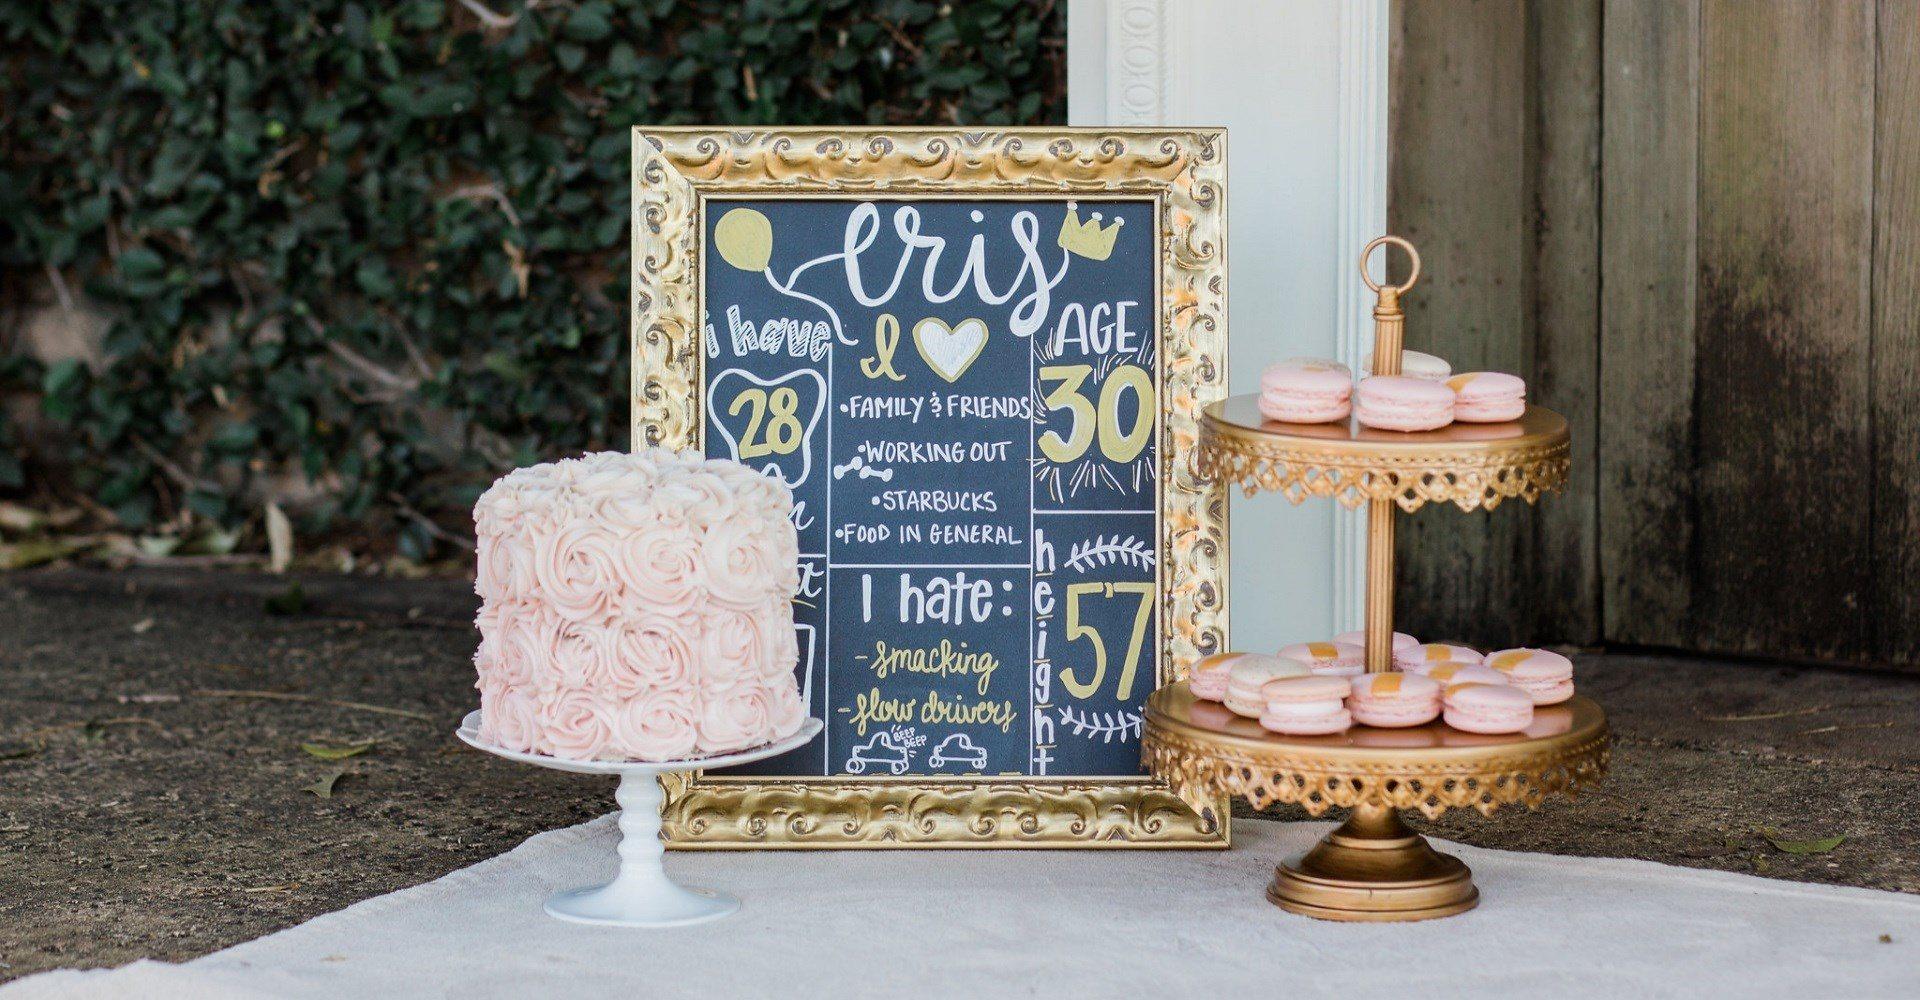 birthdaycake-macarons-tiered-cake-stand.jpg